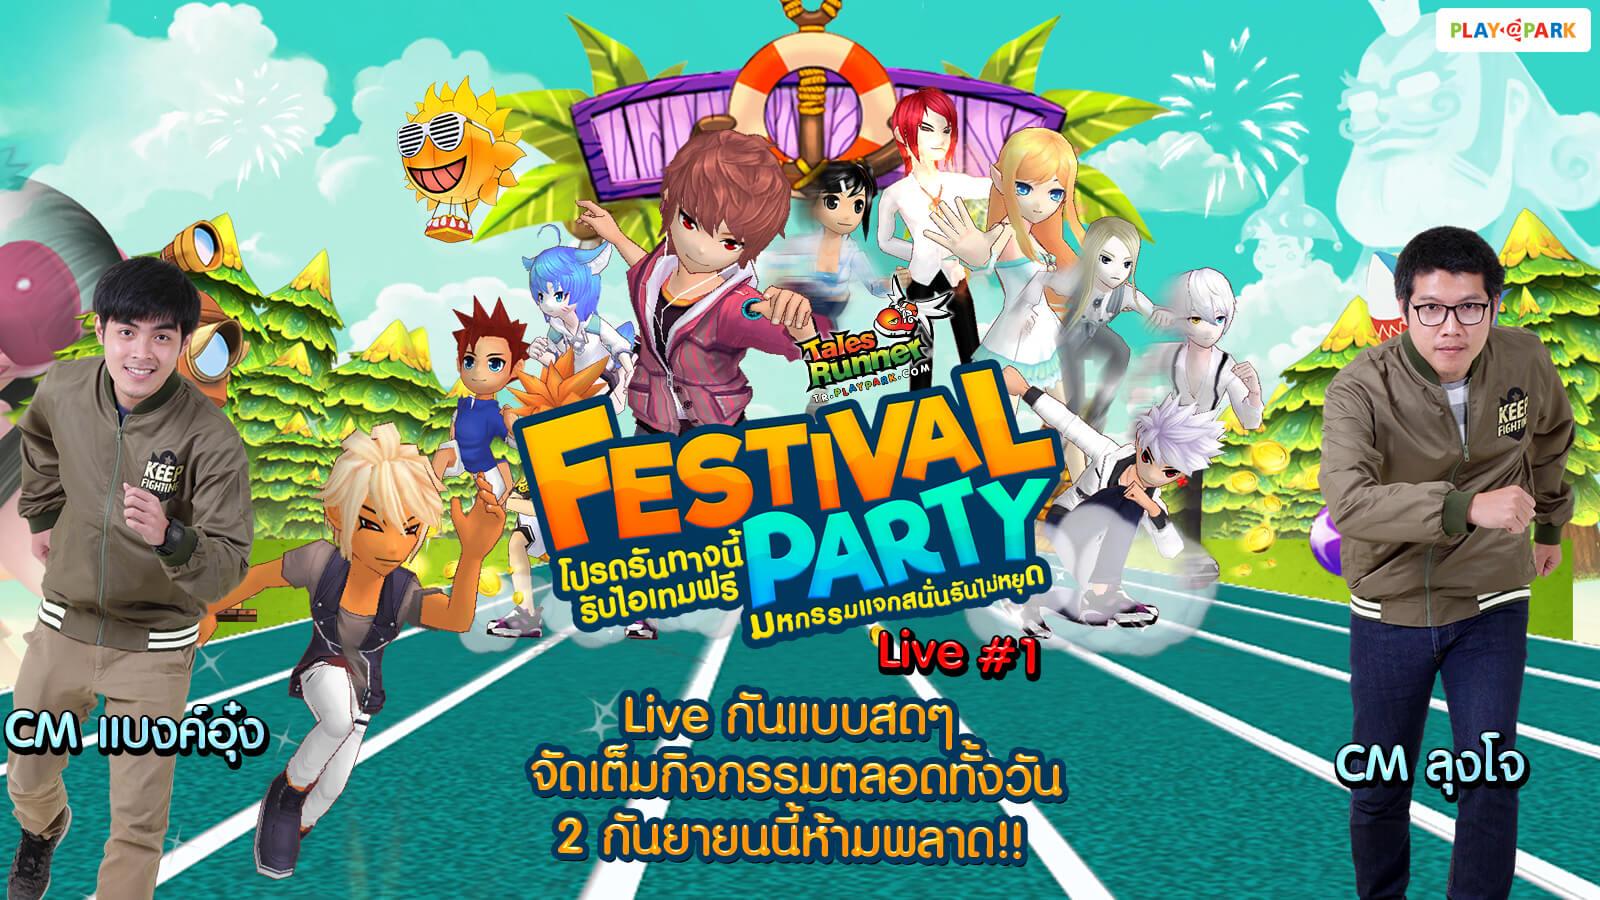 [Tales Runner] TR FESTIVAL PARTY ความสนุกสุดฟิน รับไอเทมฟรีตลอดวัน ทุกวันอาทิตย์แรกของทุกเดือน!!